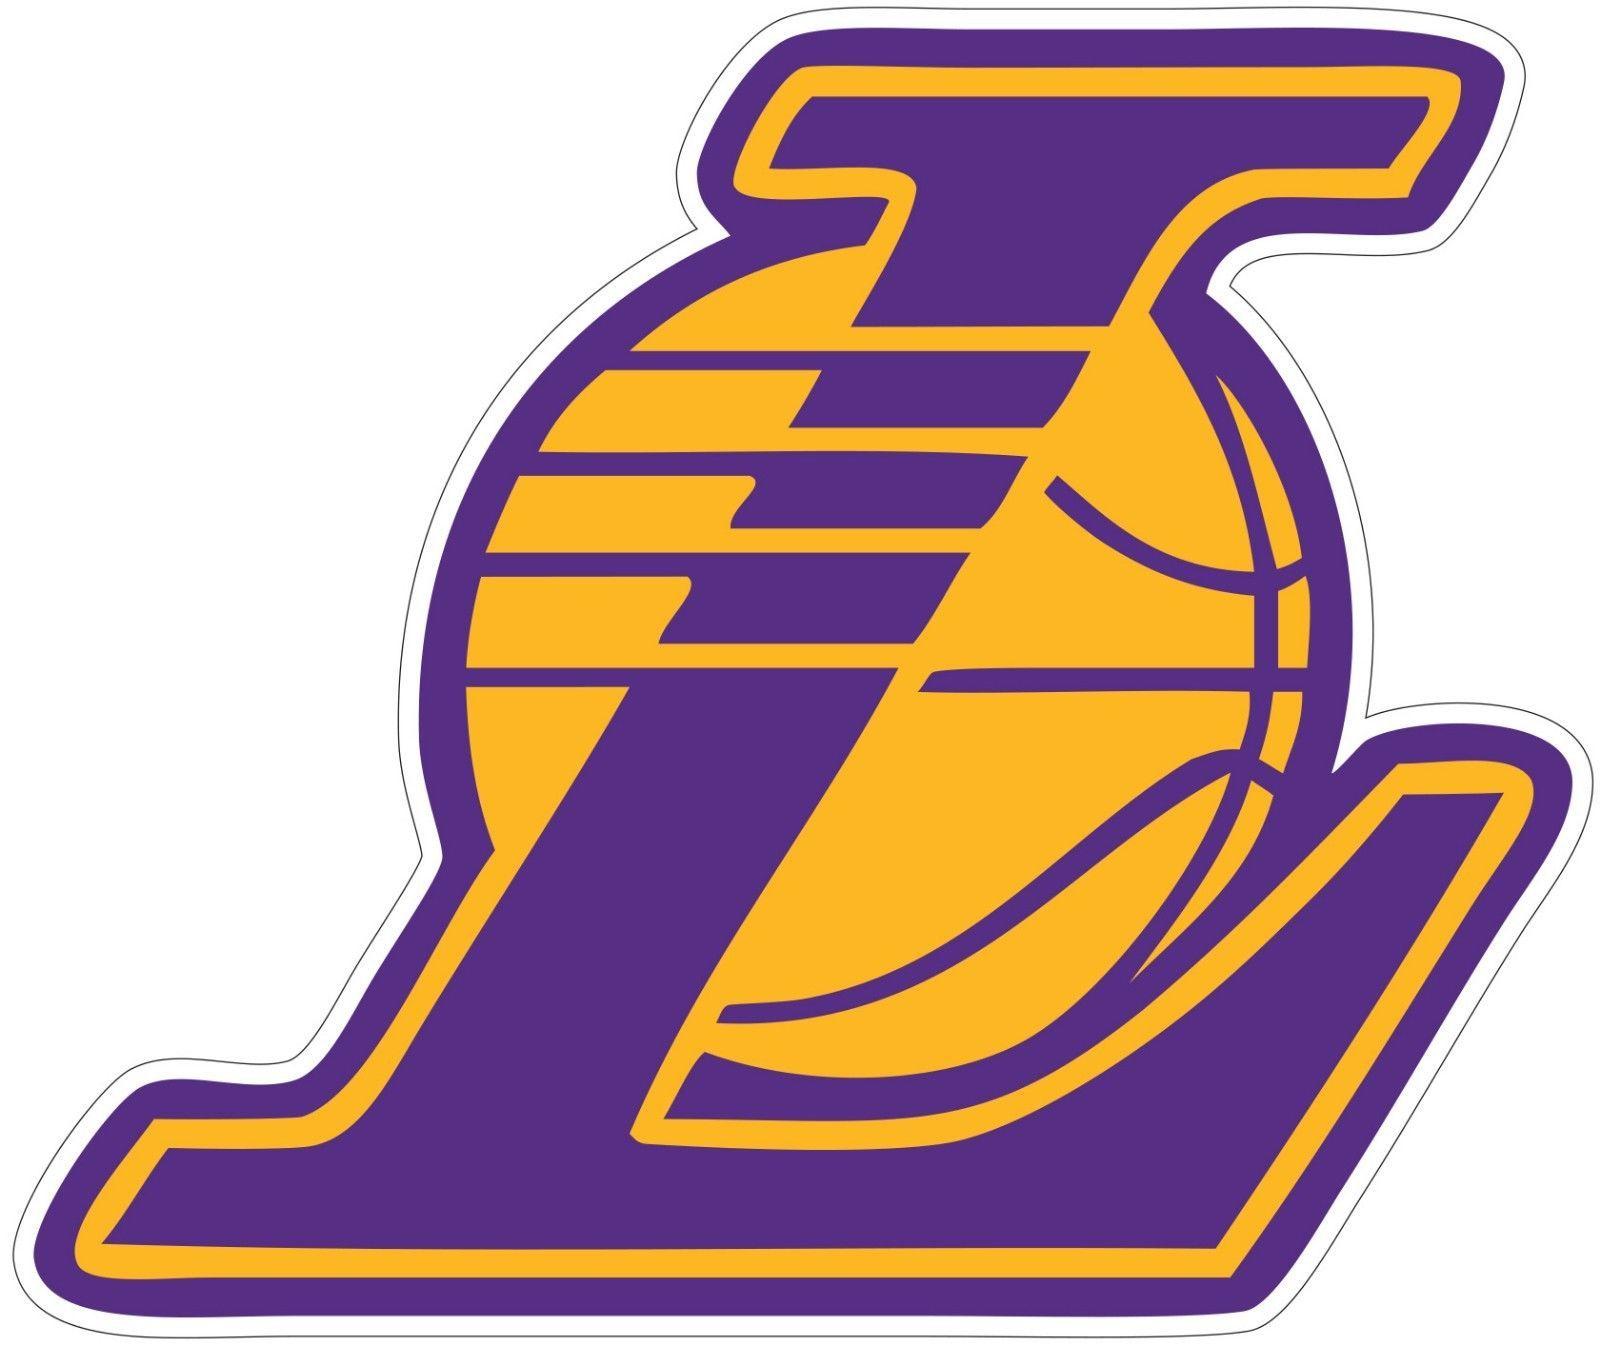 La Los Angeles Lakers Nba Vinyl Decal Sticker Sizes Free Shipping Https Uxshops Com Buy L Popular Bumper Stickers Nike Logo Wallpapers Vinyl Decal Stickers [ 1345 x 1600 Pixel ]